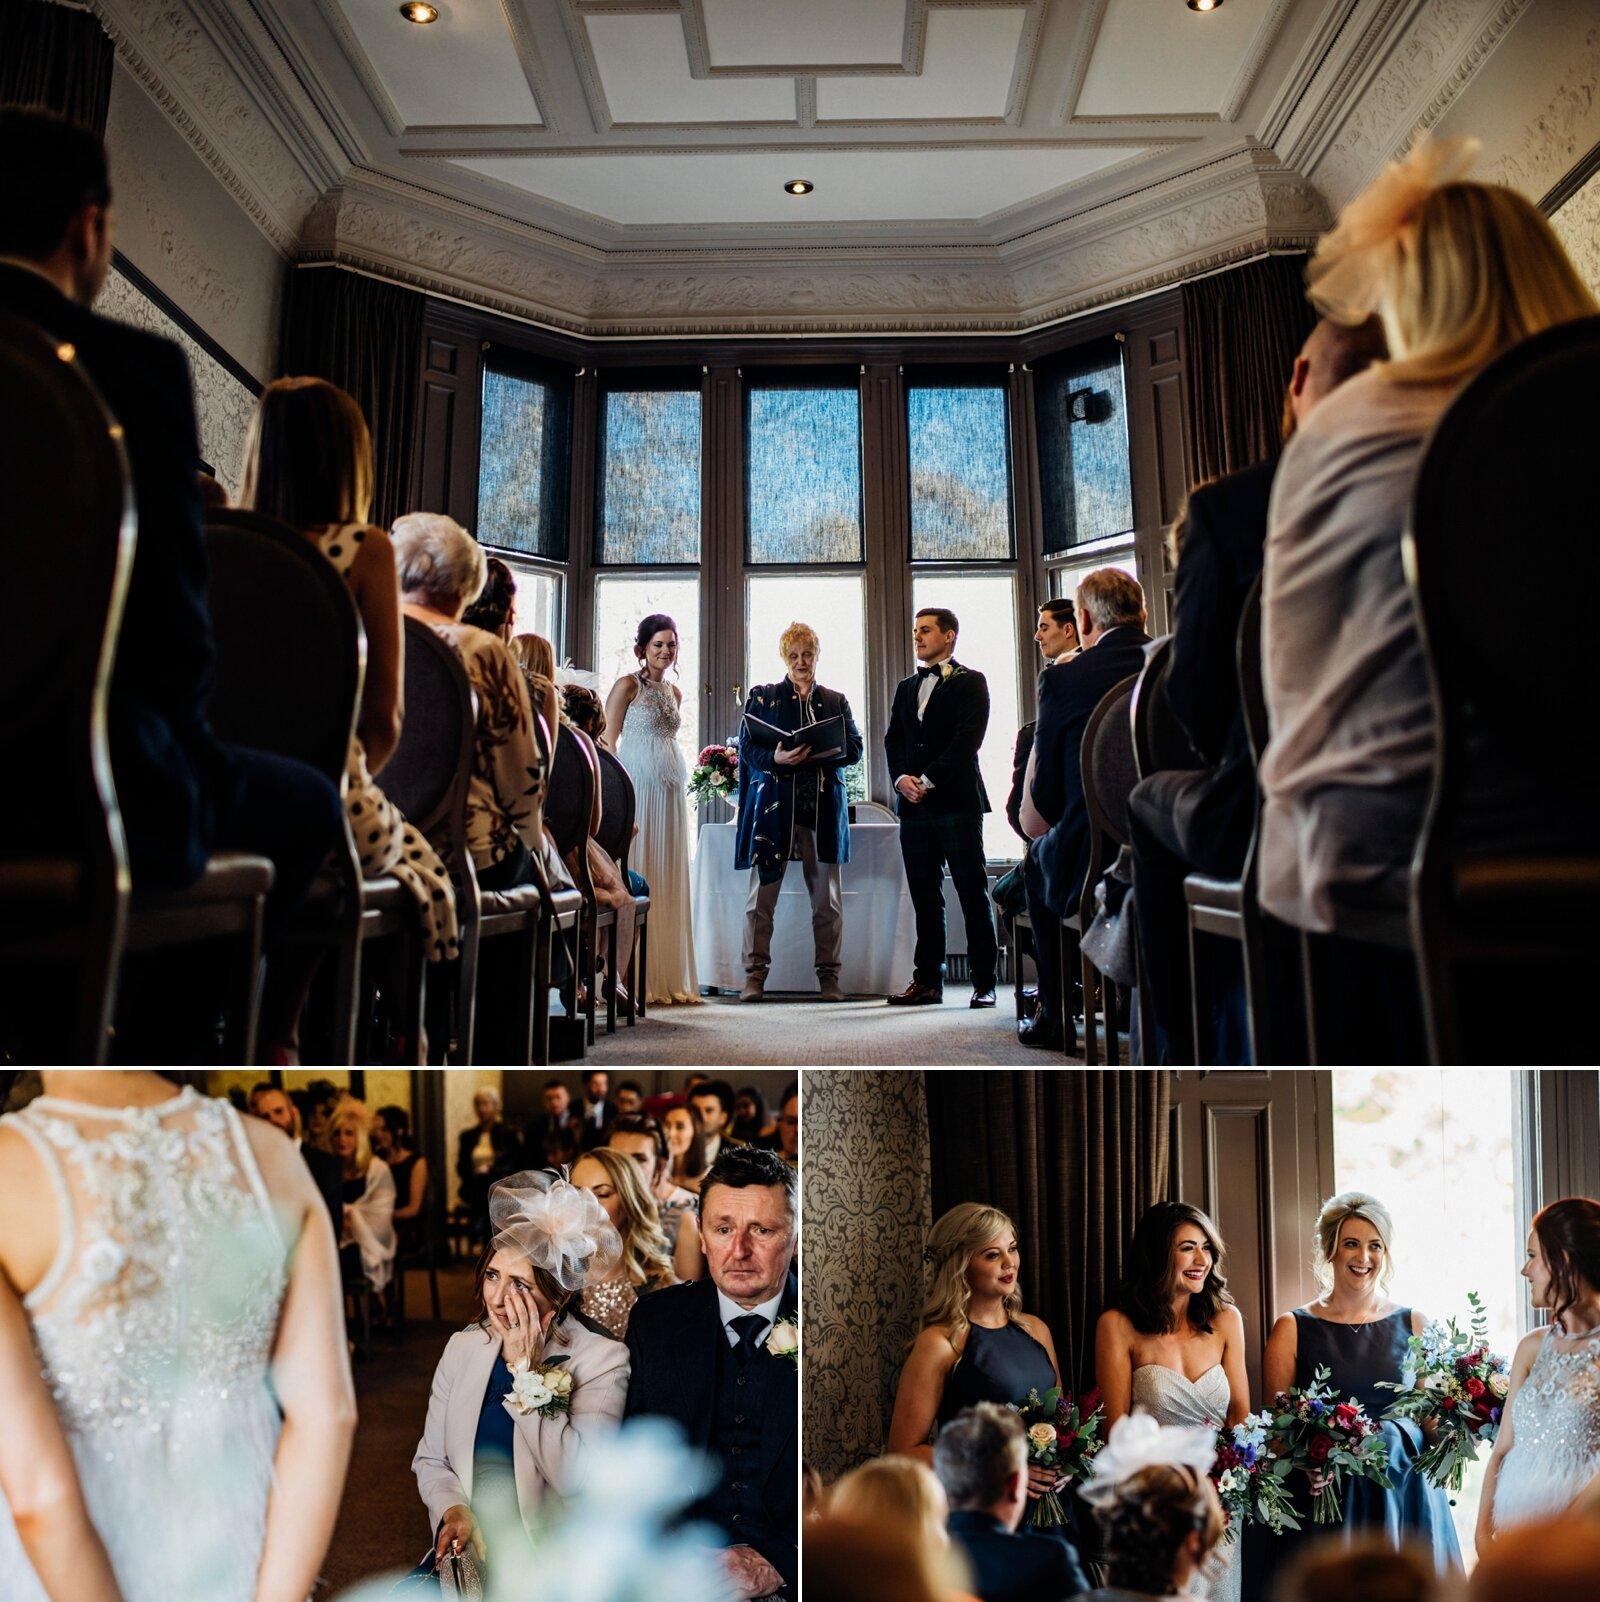 Andy&Szerdi-Photography_Ceremony_Elaine-Stephen-16.jpg